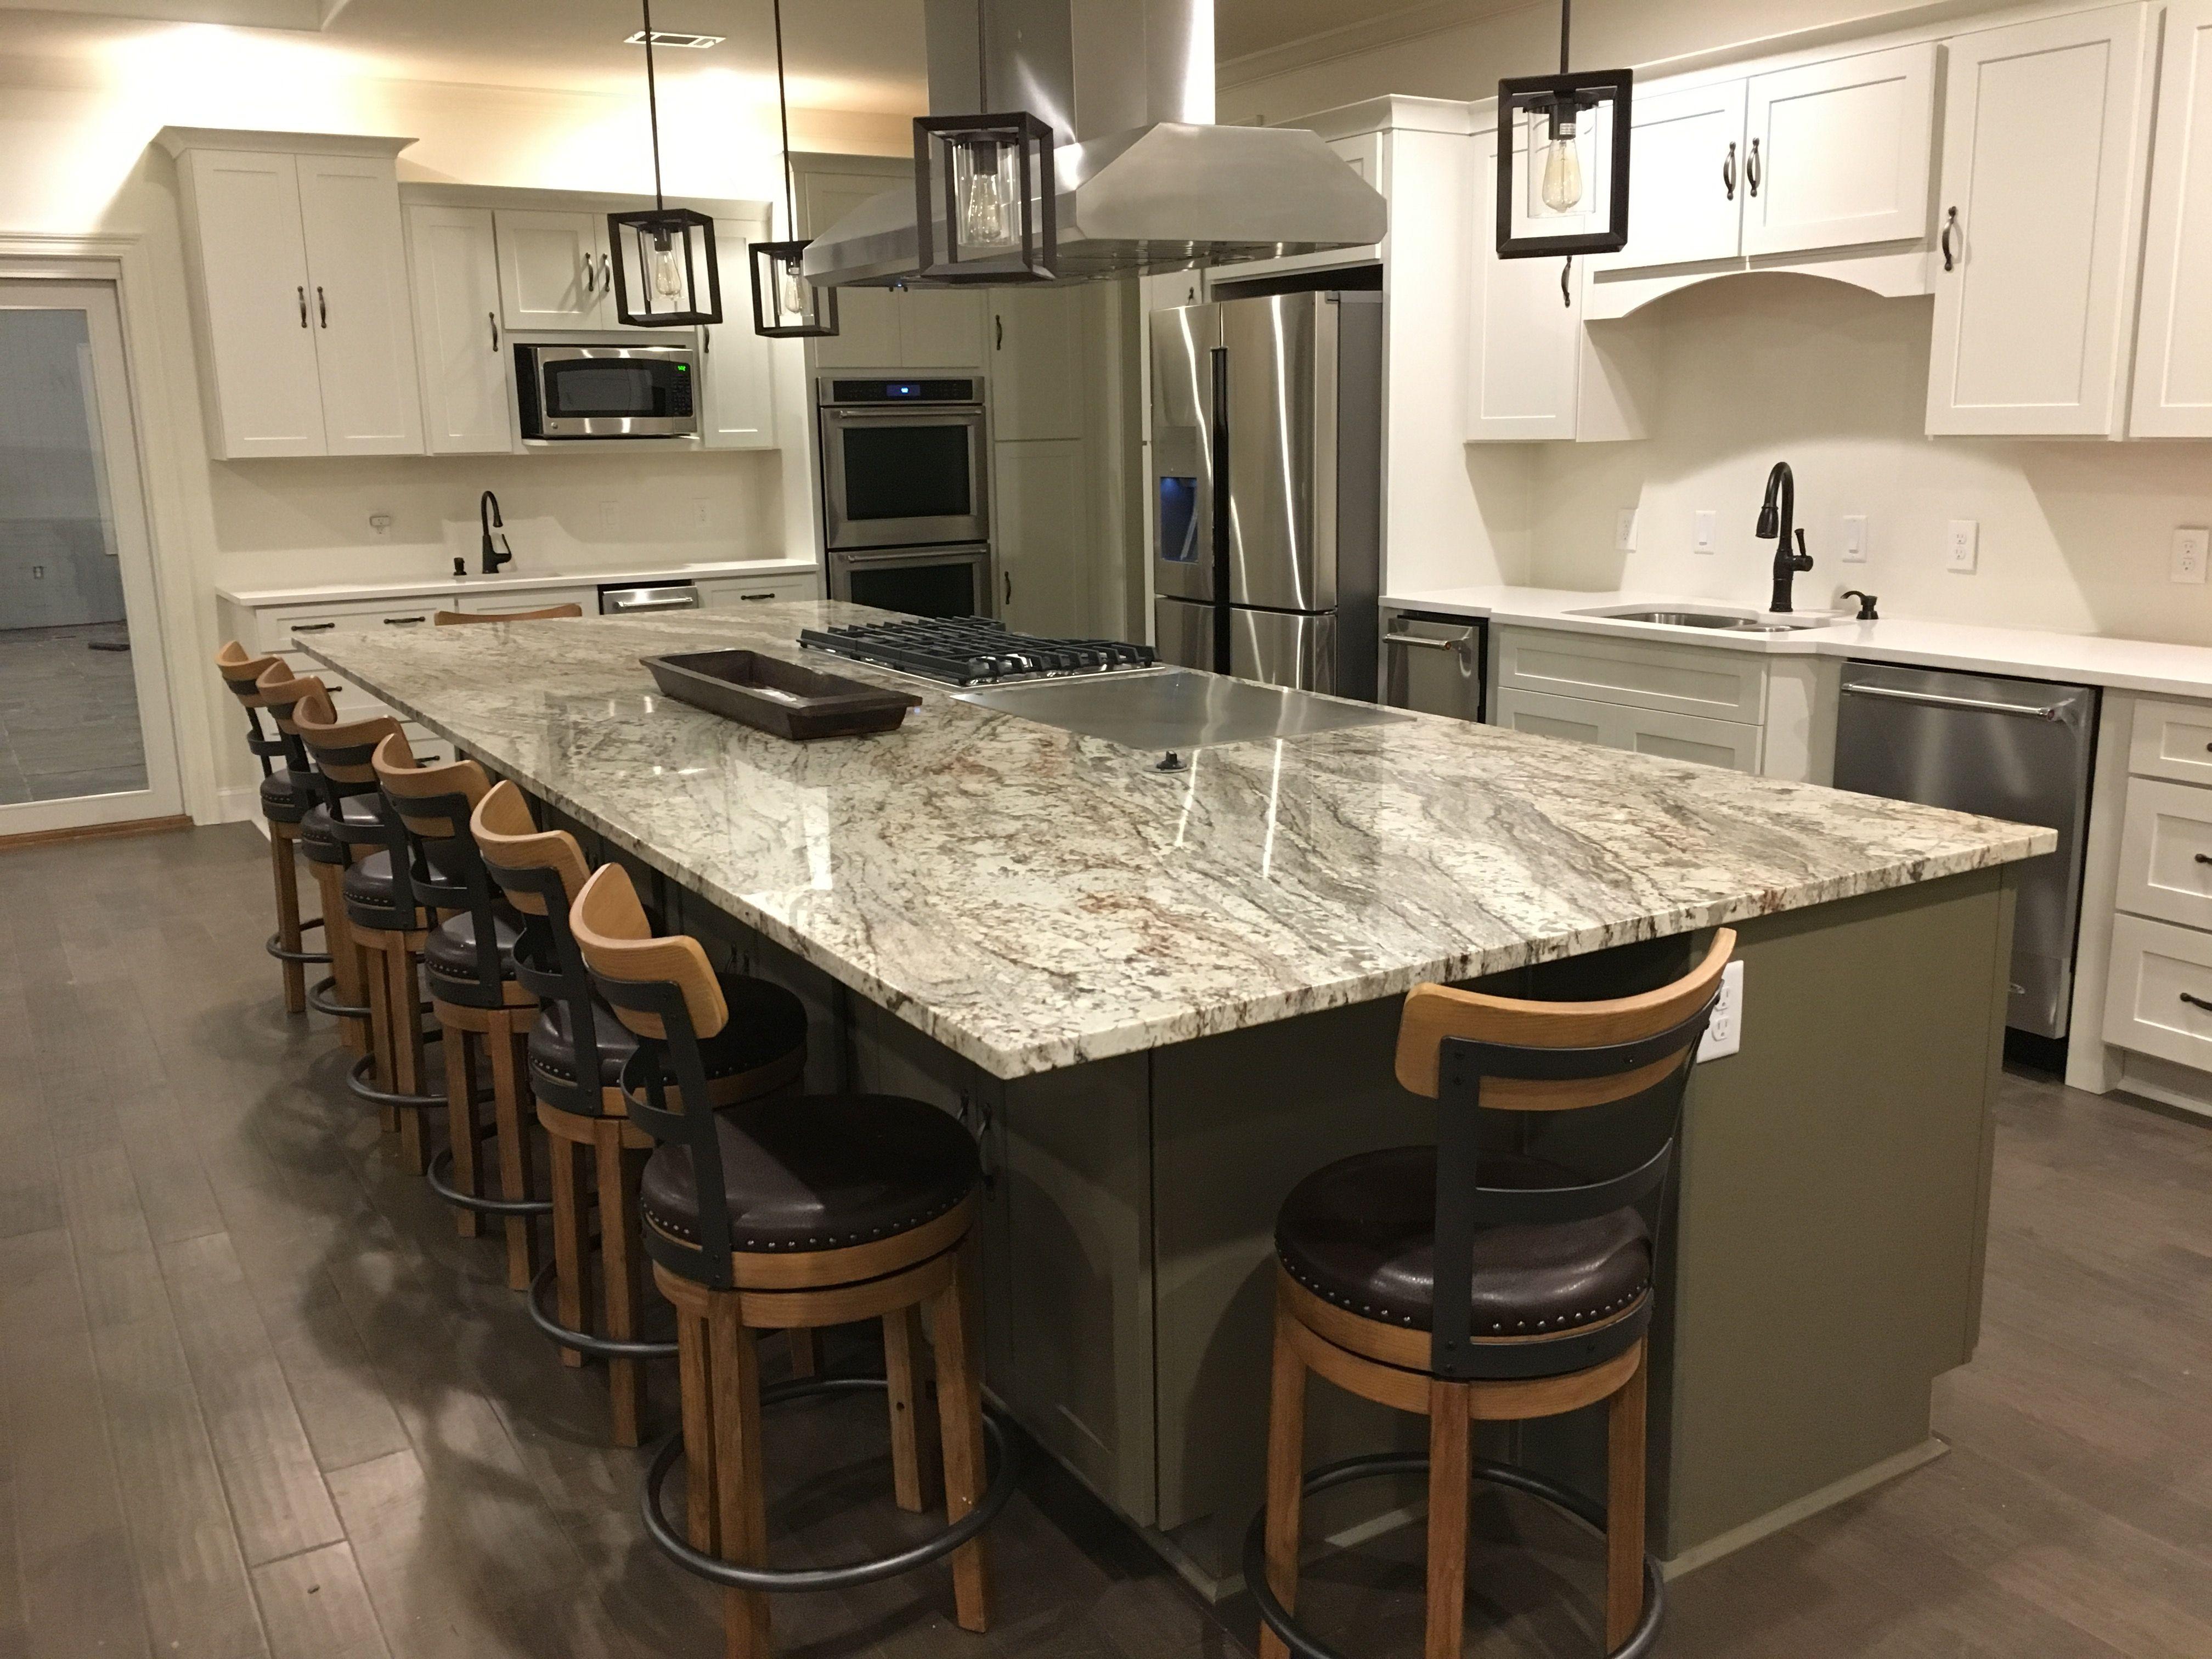 Hibachi And Gas Cooktop Cliq Studios Tea Leaf Cabinet Island Impressive Dayton Bathroom Remodeling 2018